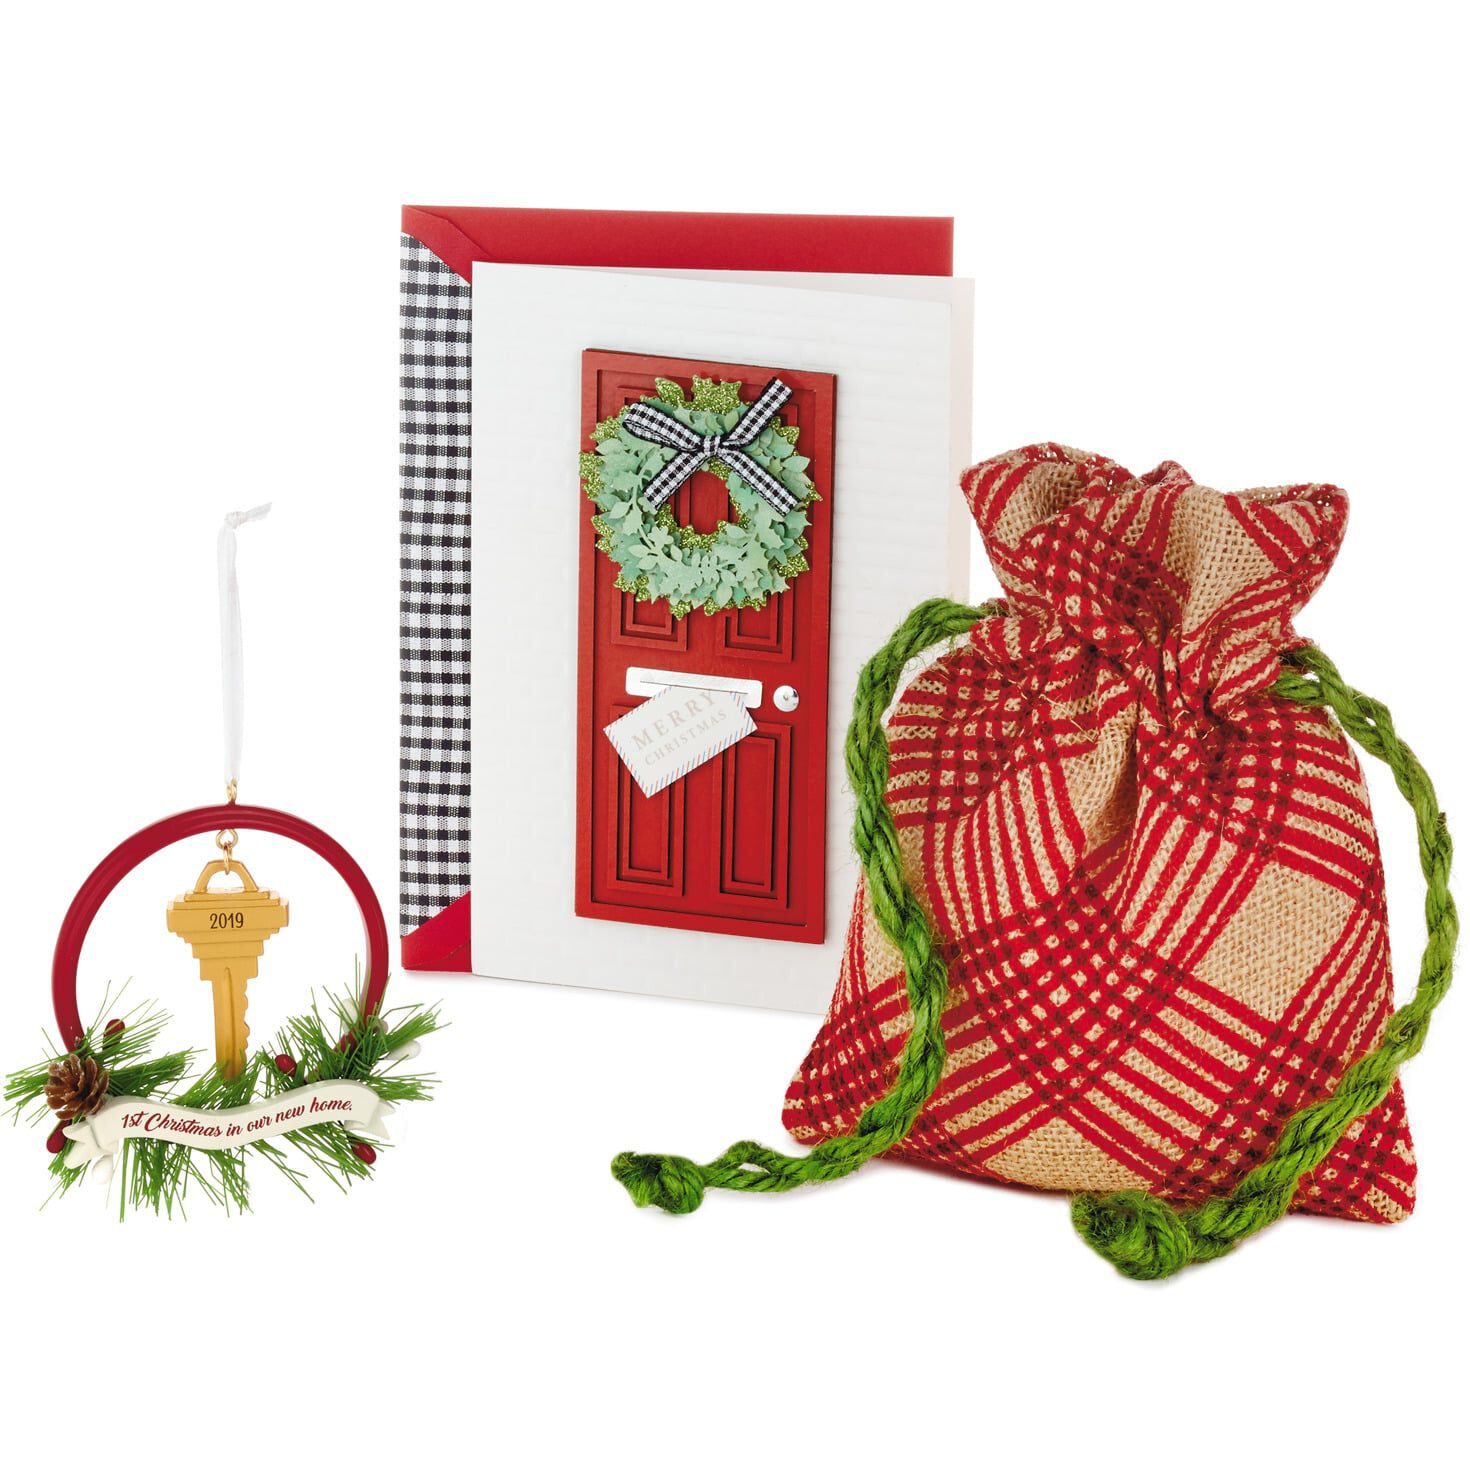 NEW HALLMARK SWEET LIL GIFTS CHRISTMAS SWEATER TREAT BOWLS 2